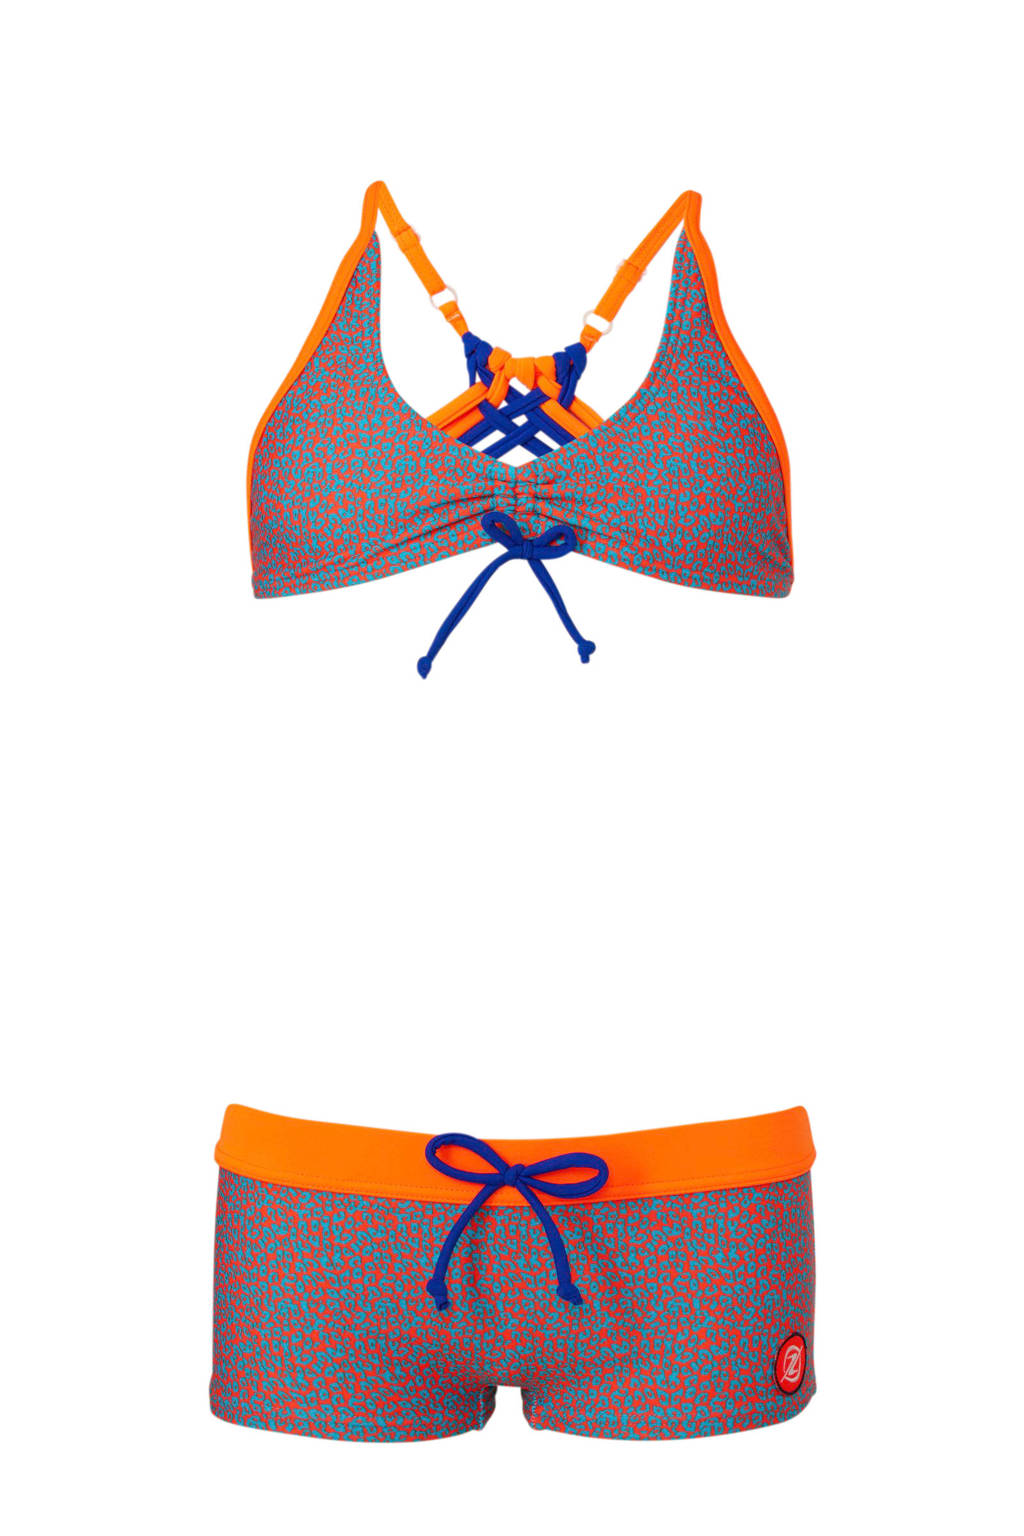 Zee & Zo bikini met all-over panterprint oranje/blauw, Oranje/blauw